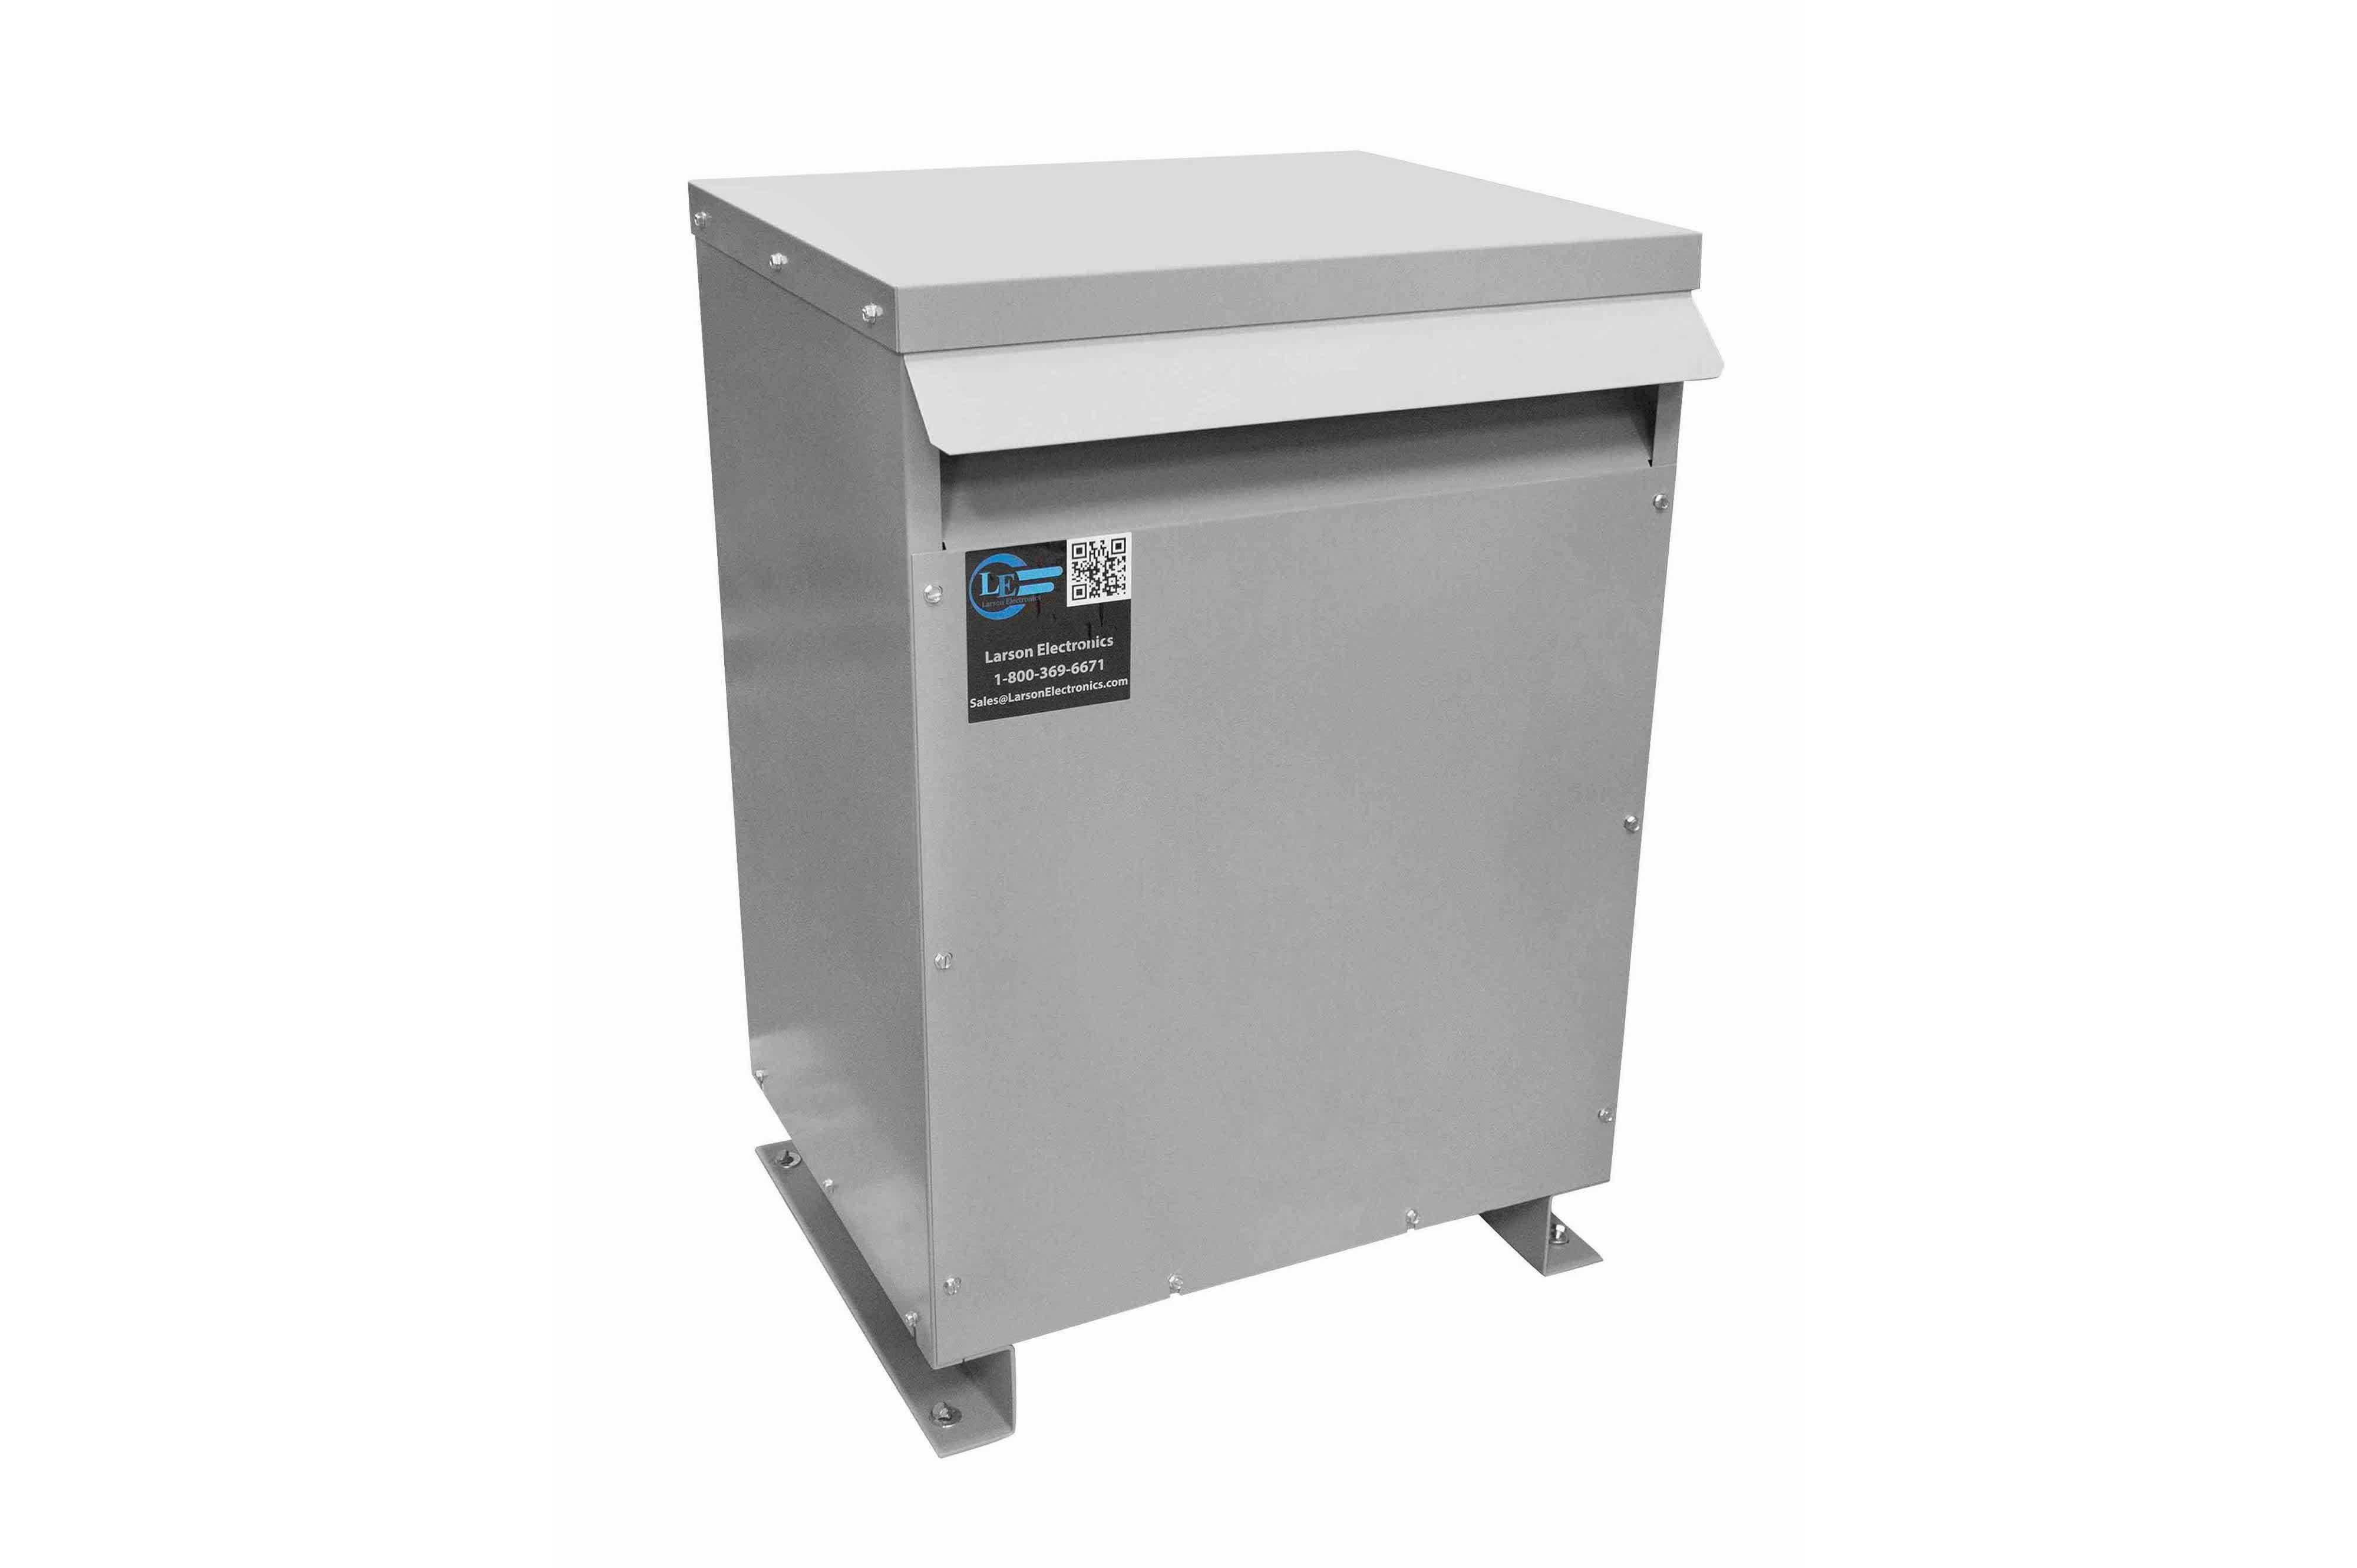 600 kVA 3PH Isolation Transformer, 460V Wye Primary, 400Y/231 Wye-N Secondary, N3R, Ventilated, 60 Hz